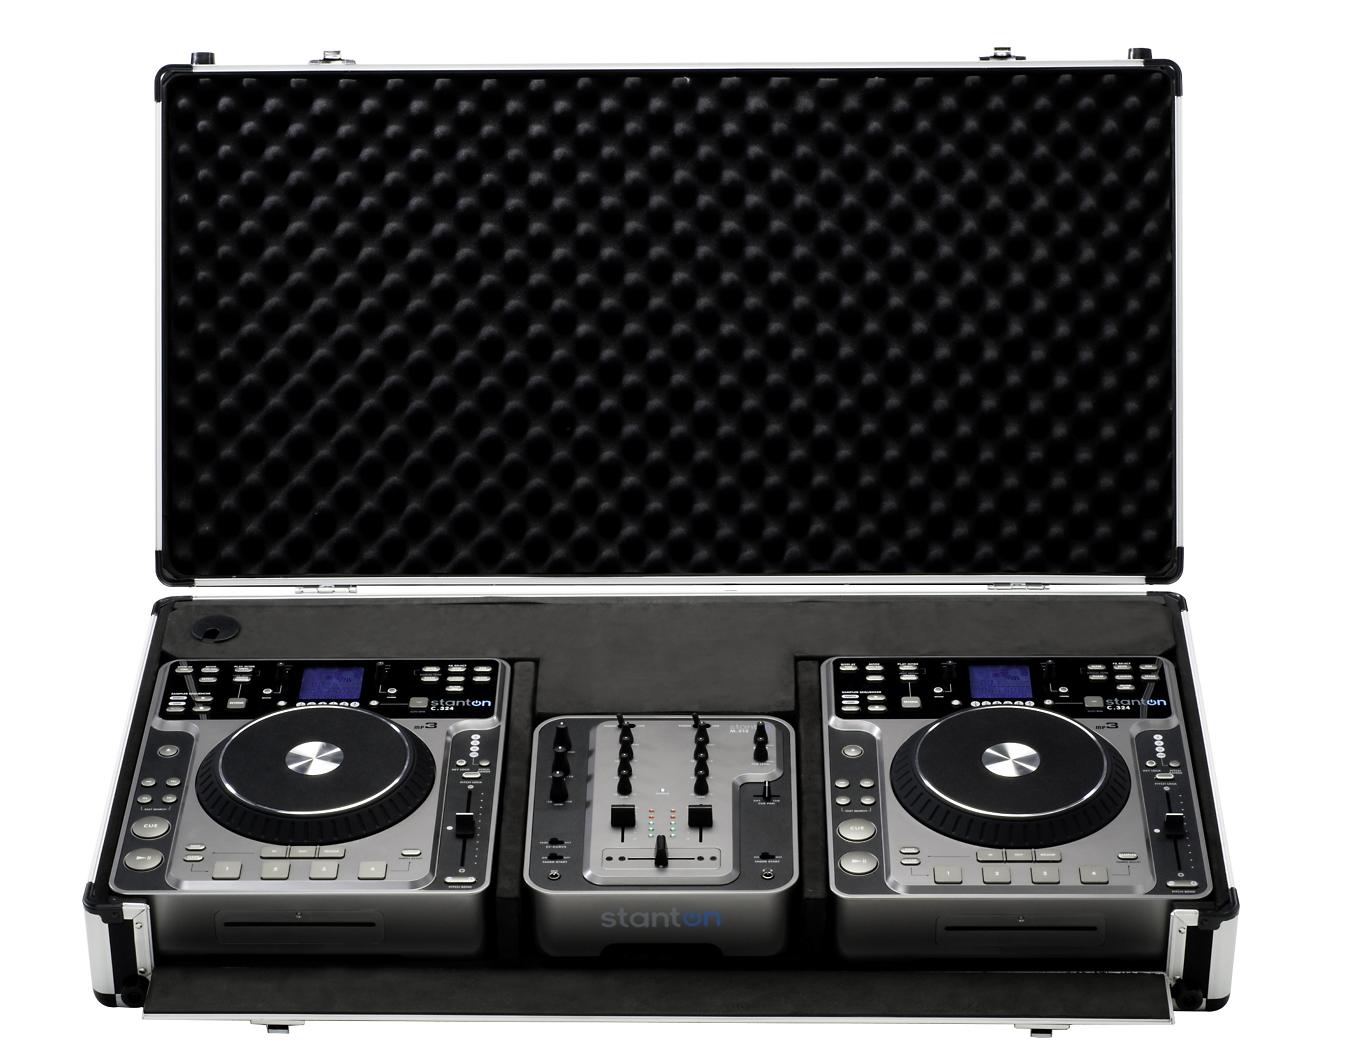 Lot 10 - 1 X STANTON DIGIPAK PRO.V4 DJ TURNTABLE AUDIO PORTABLE SYSTEMS